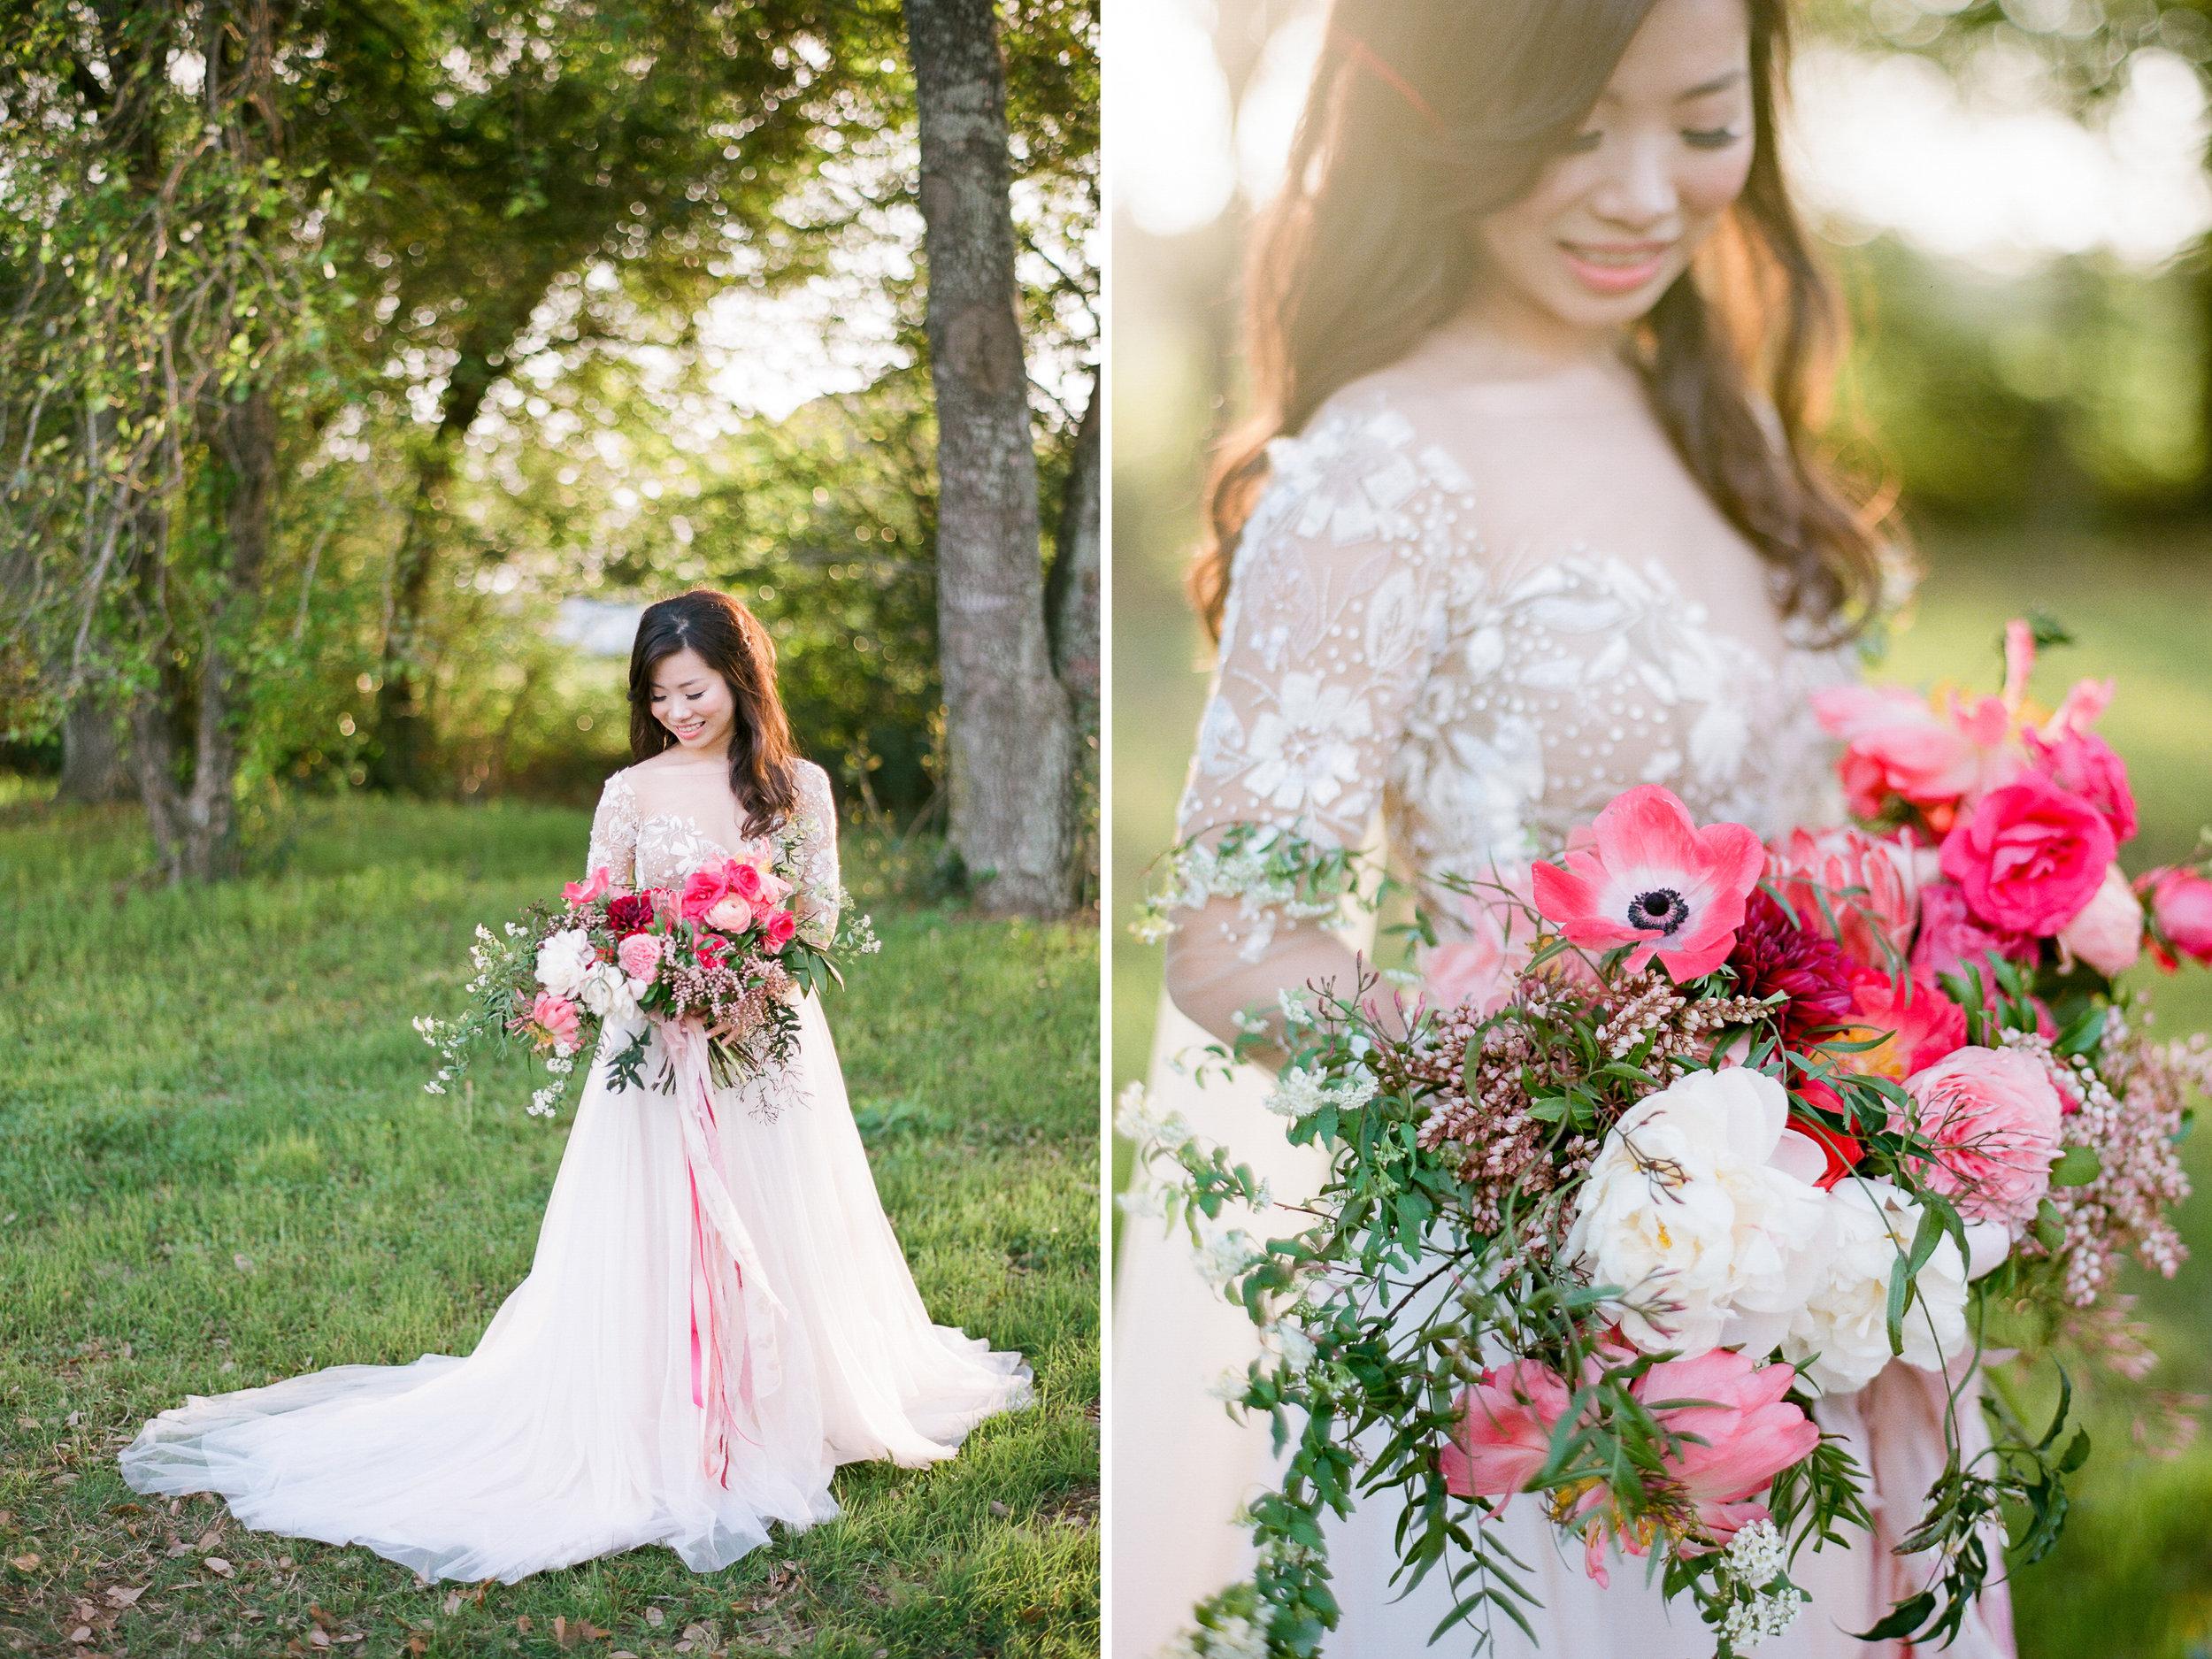 The-Knot-50-Weddings-50-States-Texas-Winner-Dana-Fernandez-photography-houston-wedding-photographer-film-fine-art-destination-108.jpg